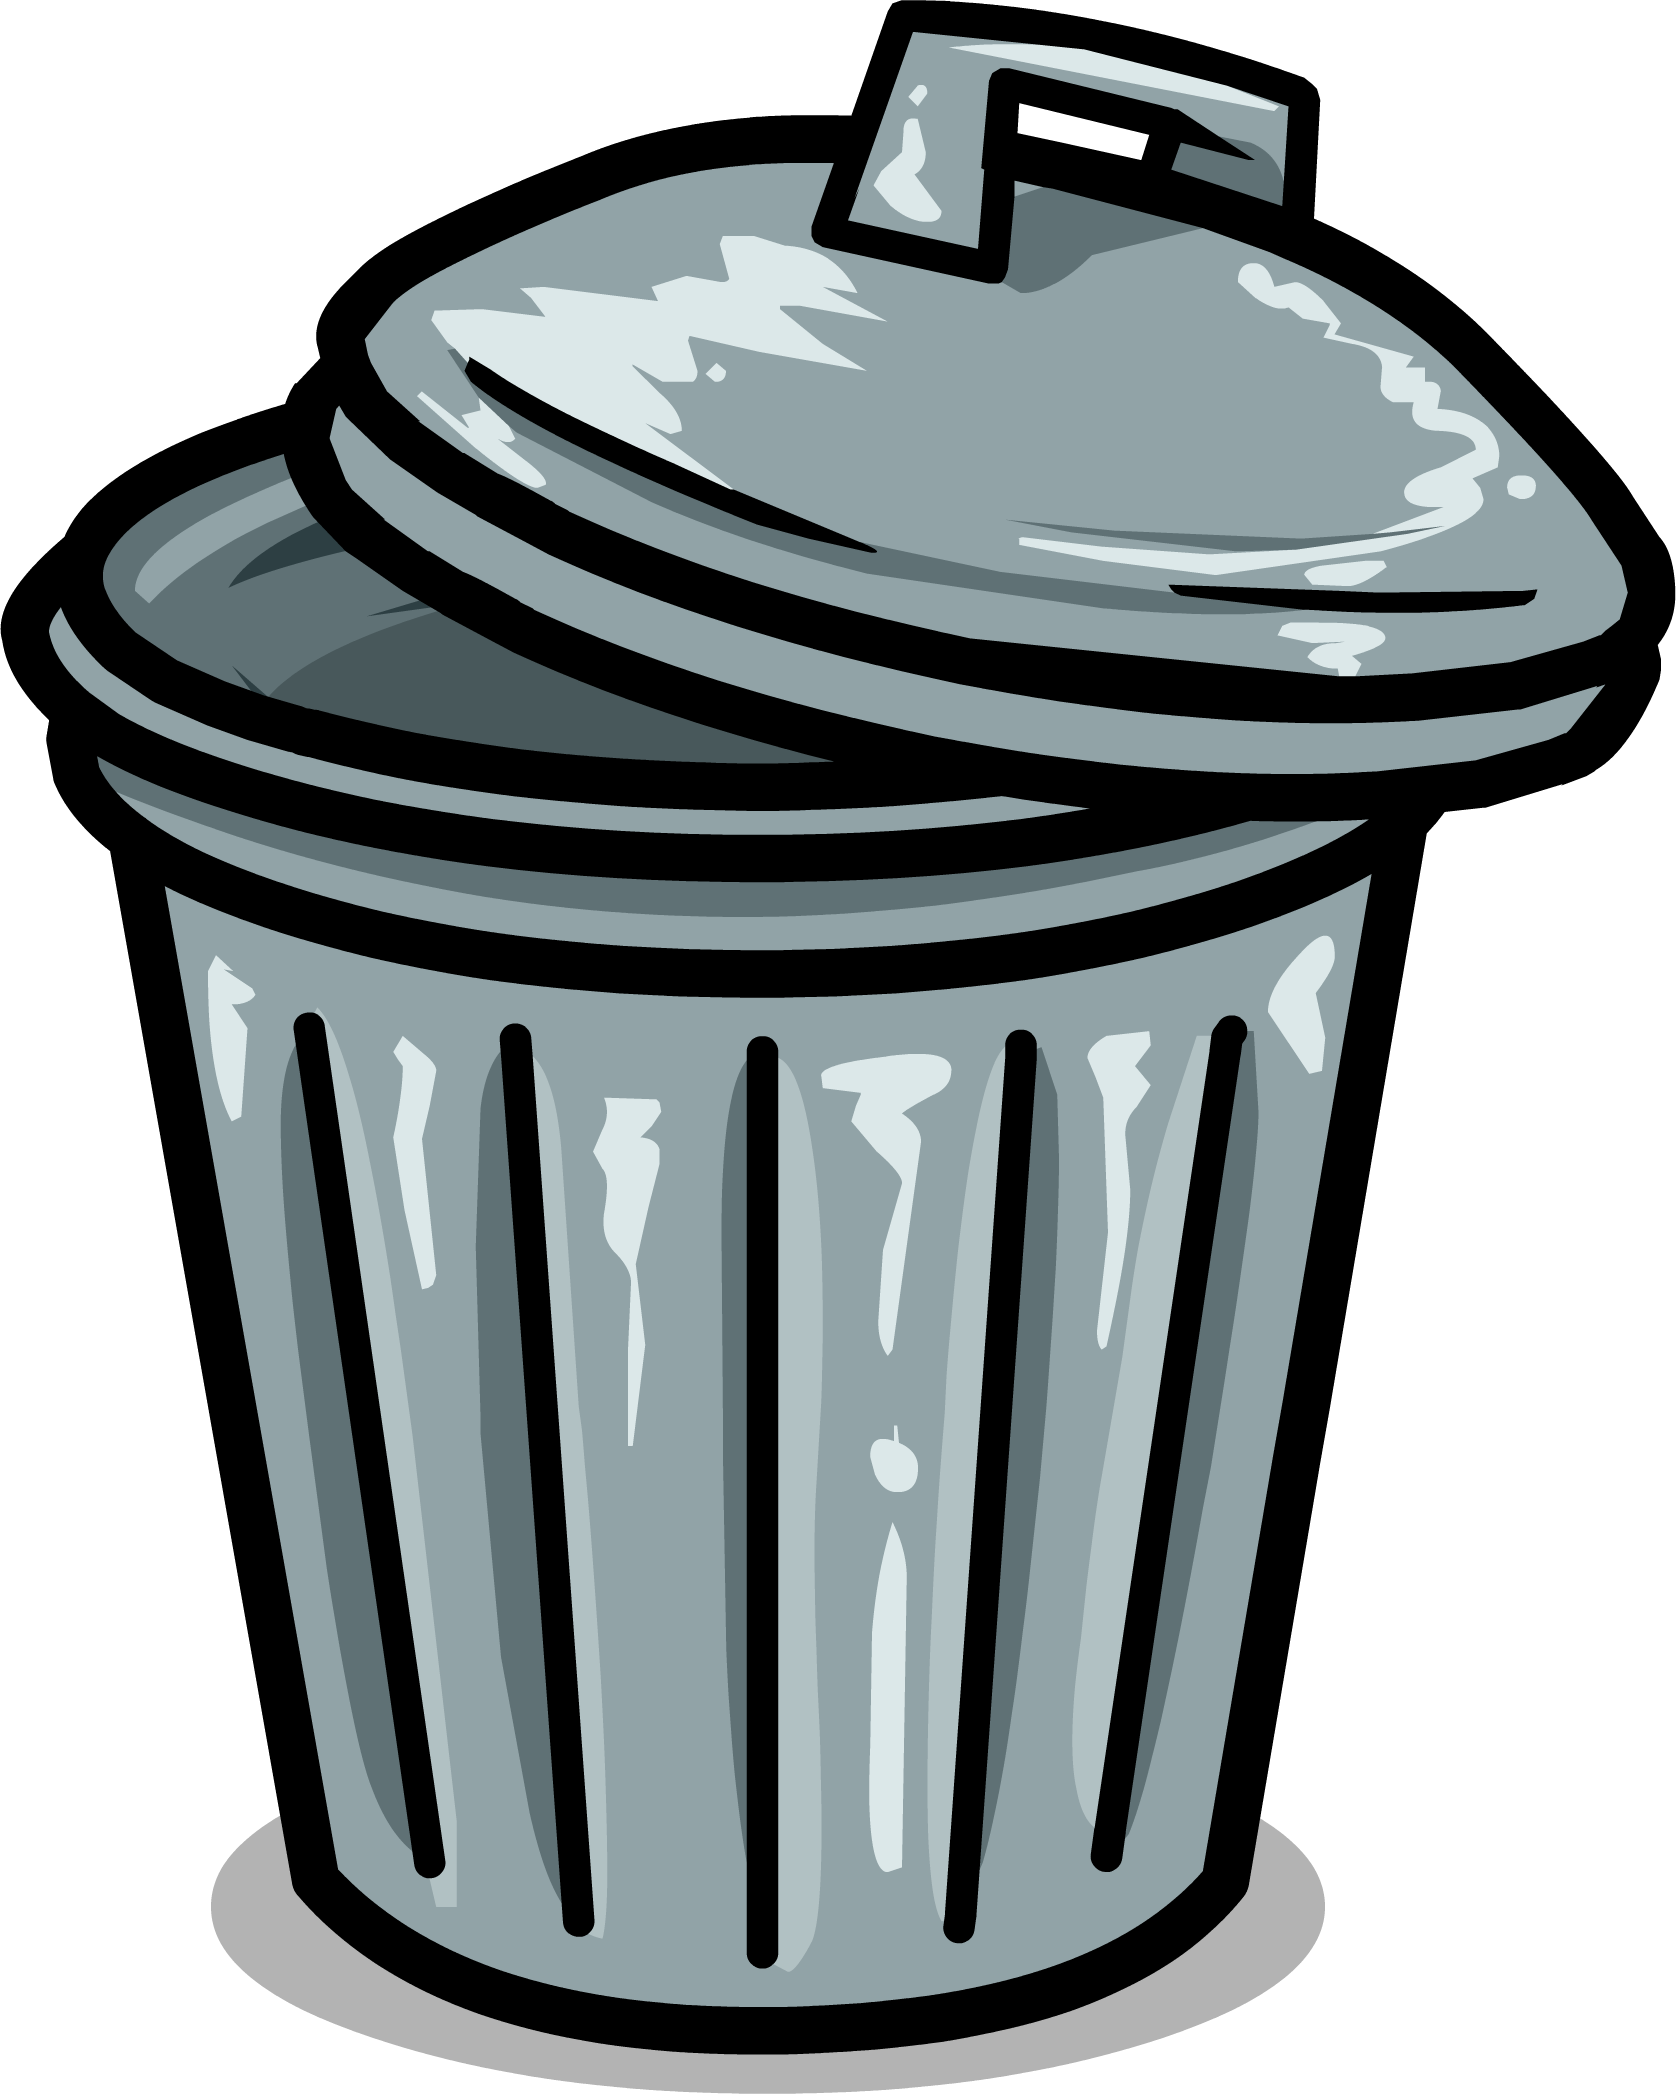 Water clipart bin. Public utilities breckenridge co